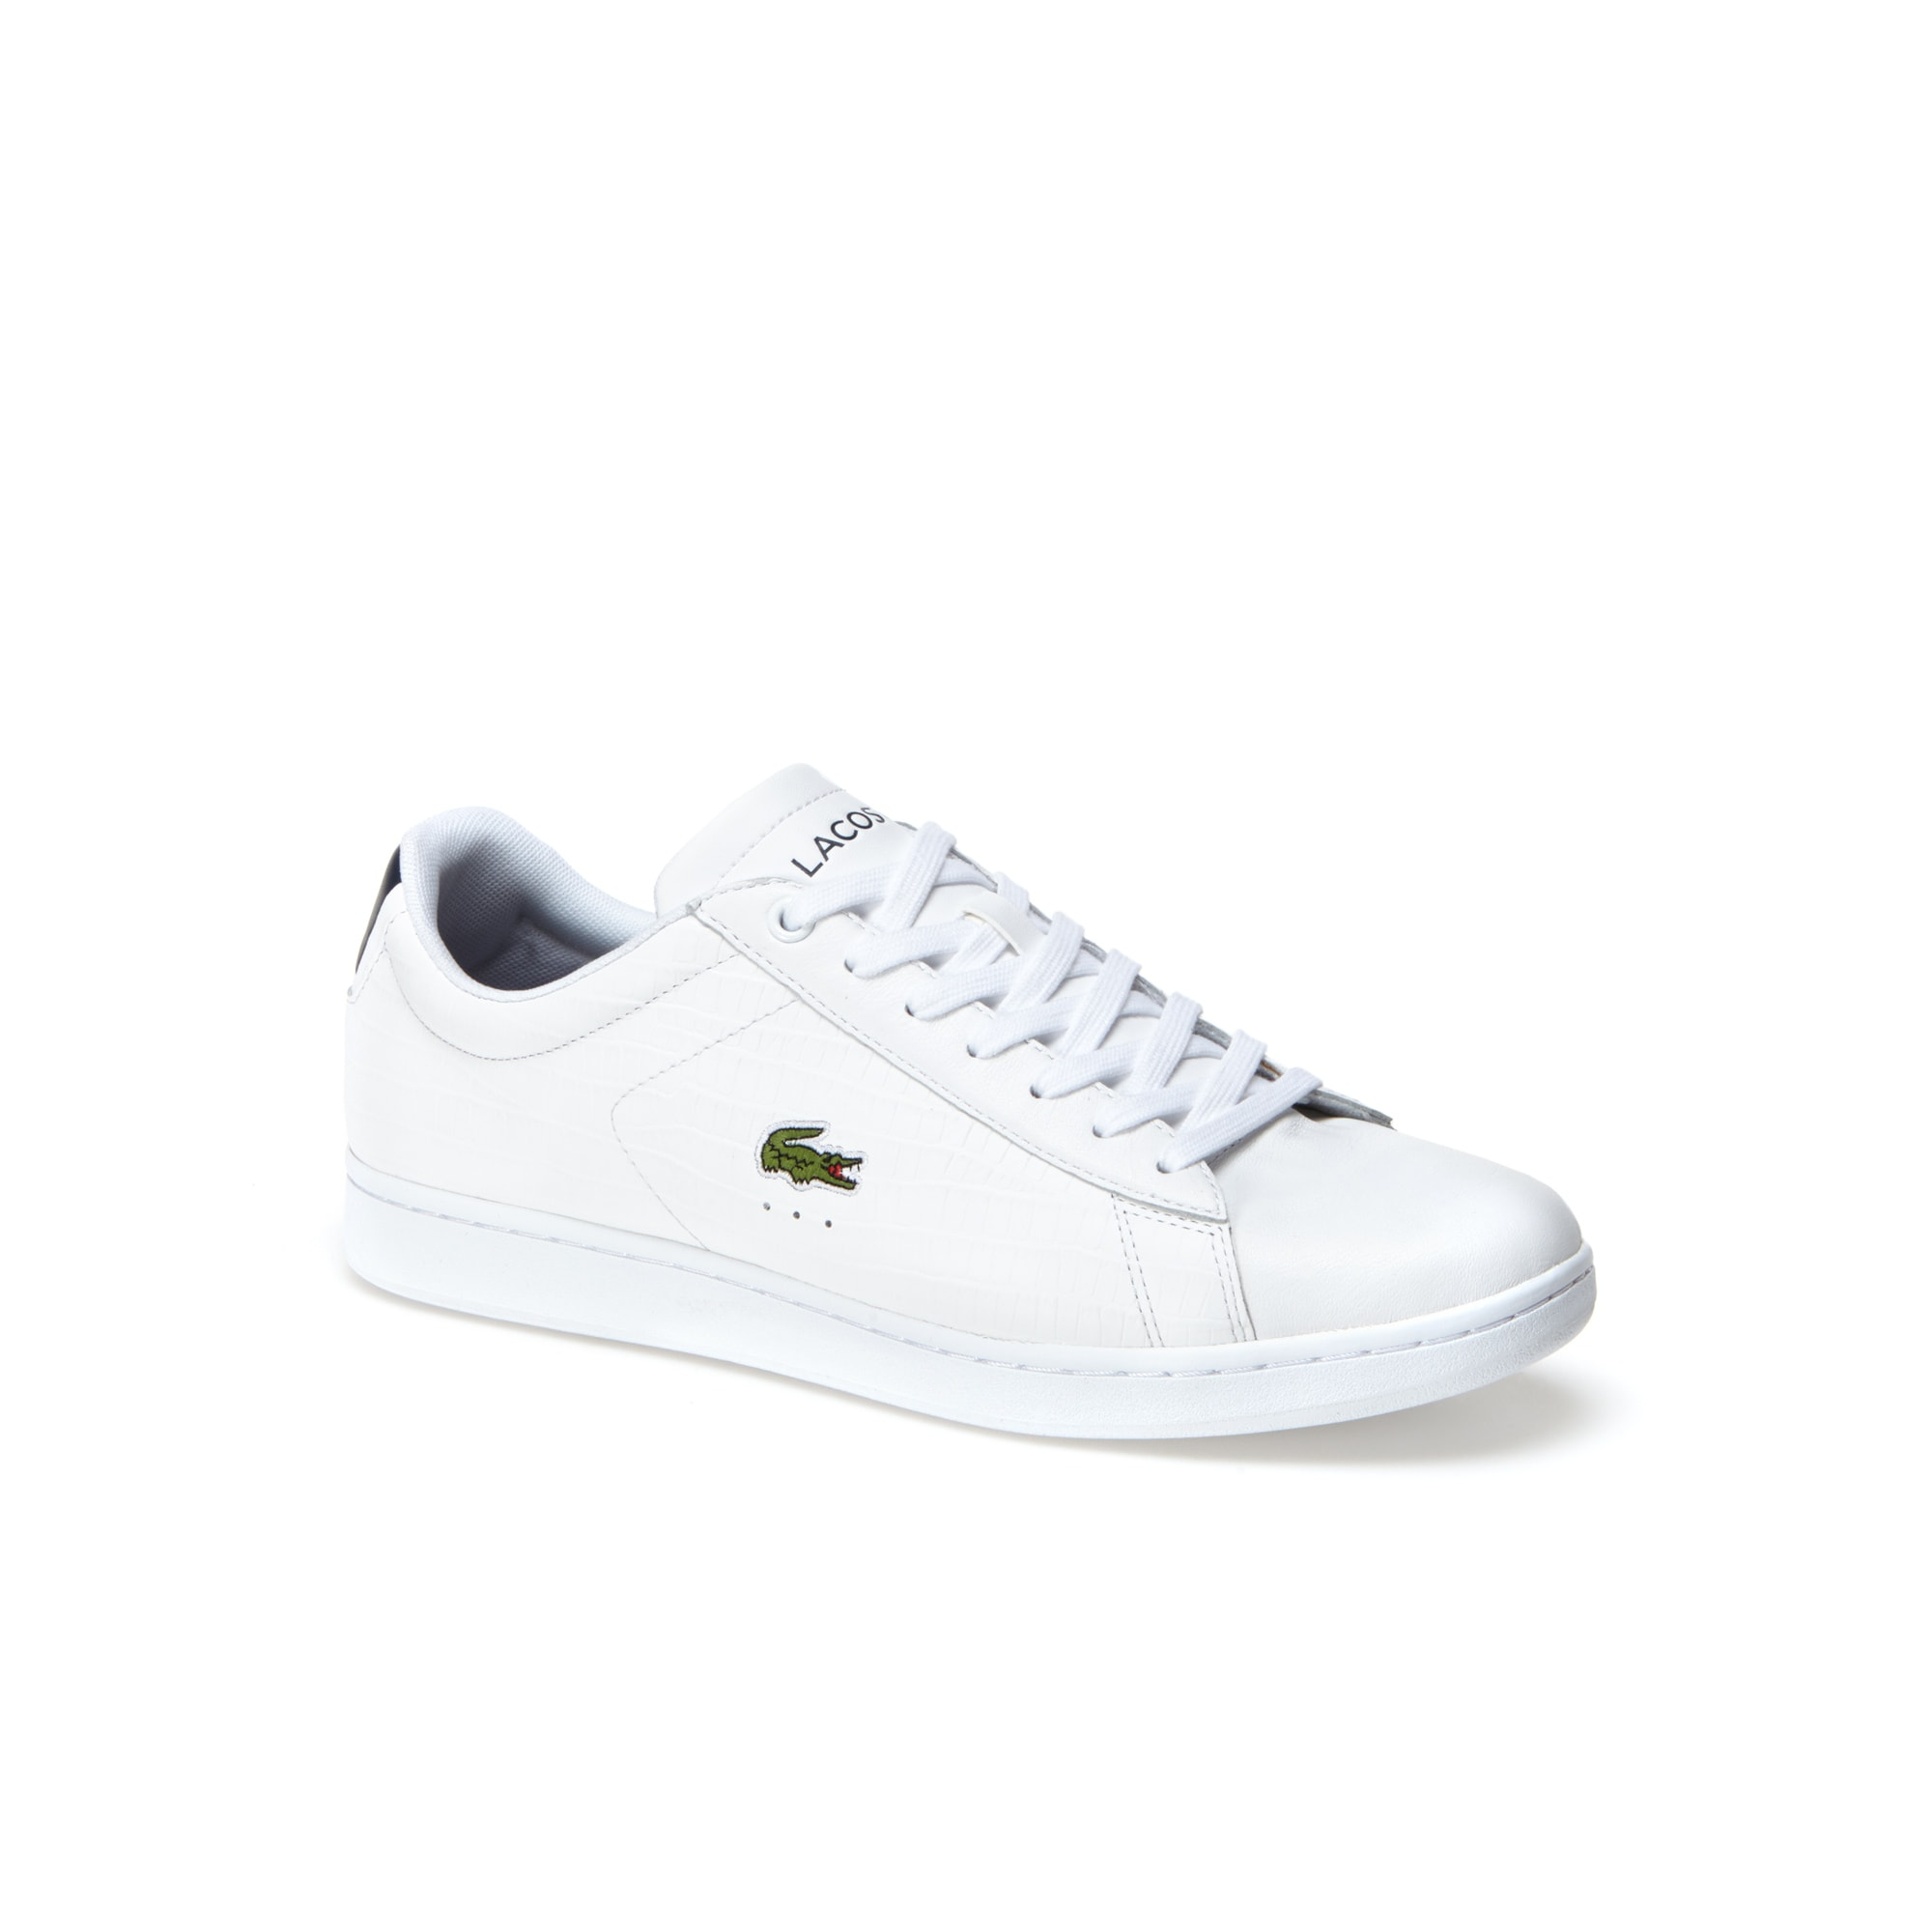 Men's Carnaby Evo Low-Rise Contrast Heel Sneakers